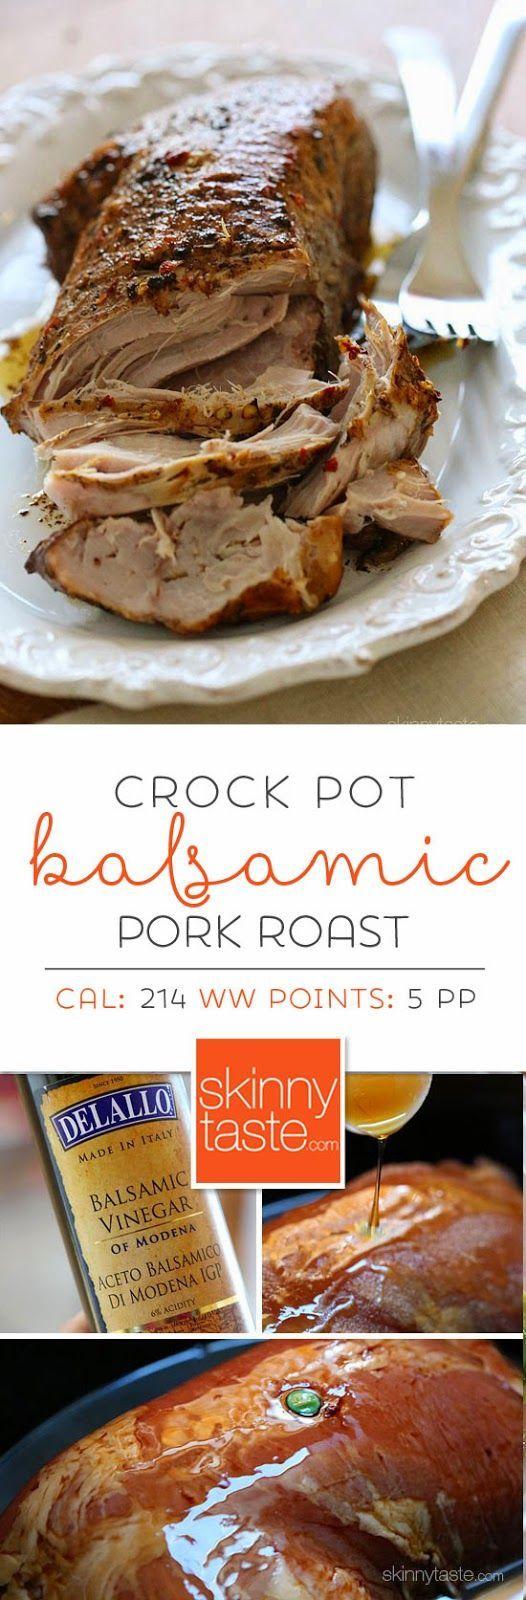 Crock Pot Balsamic Pork Roast –easy, lean and delicious!